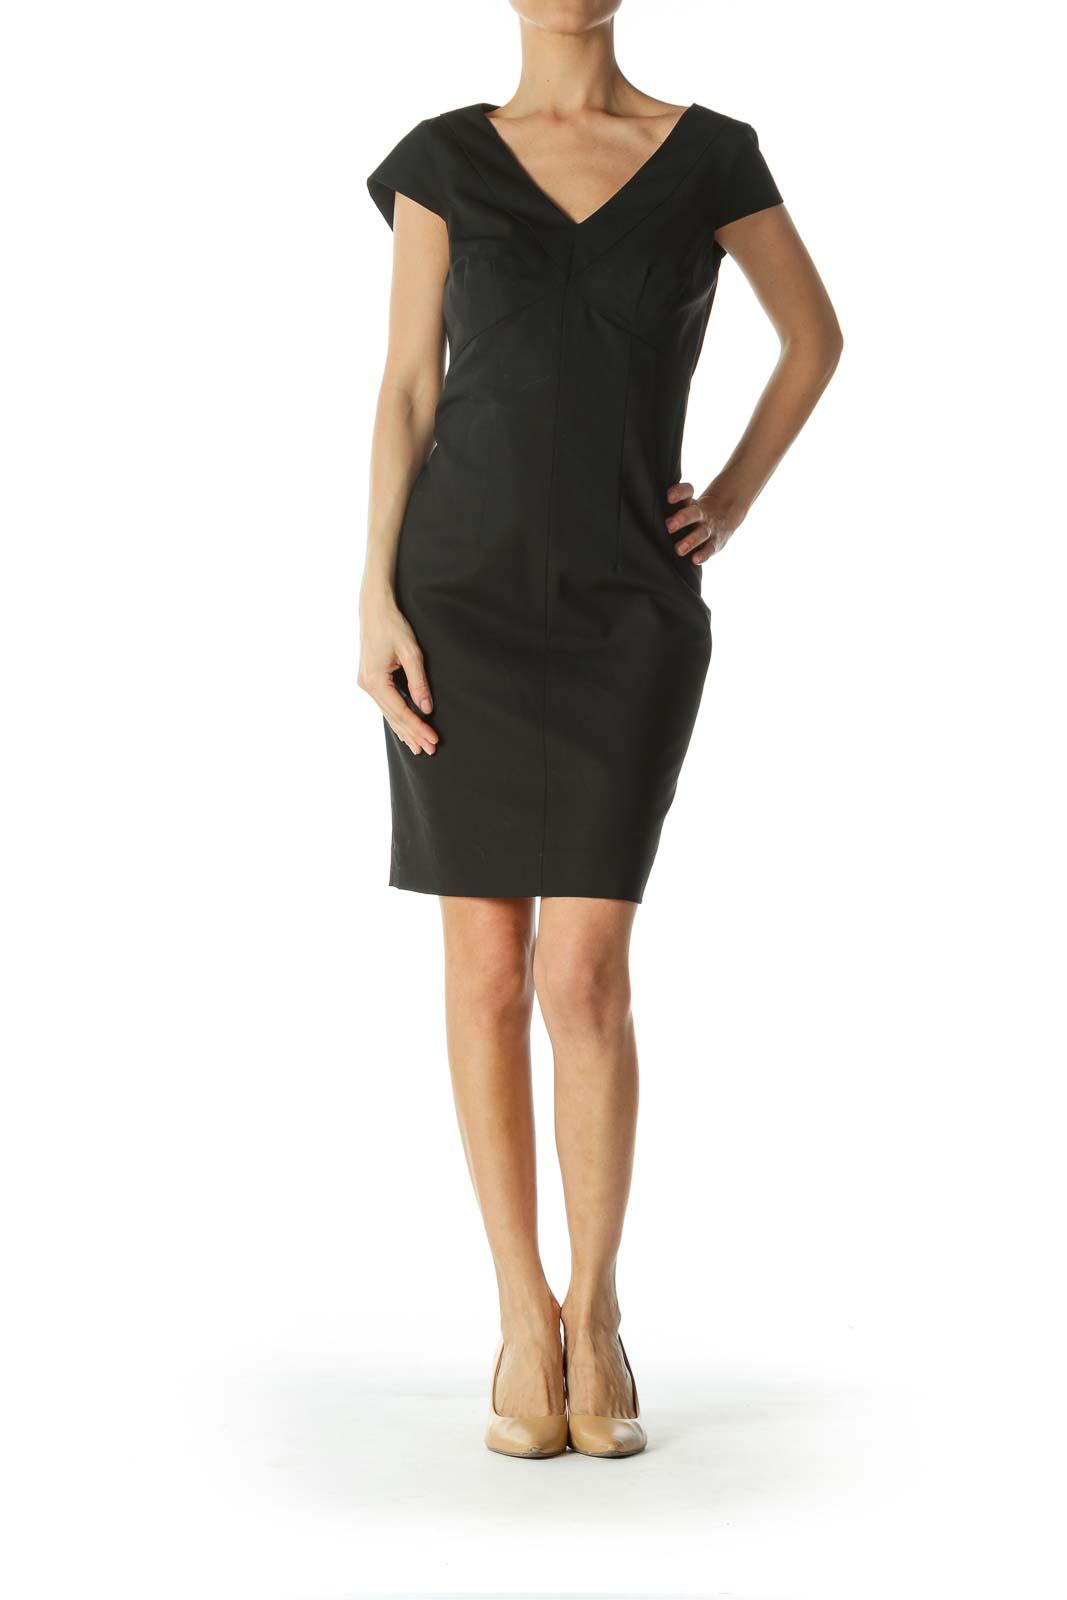 Black Short-Sleeve Work Dress